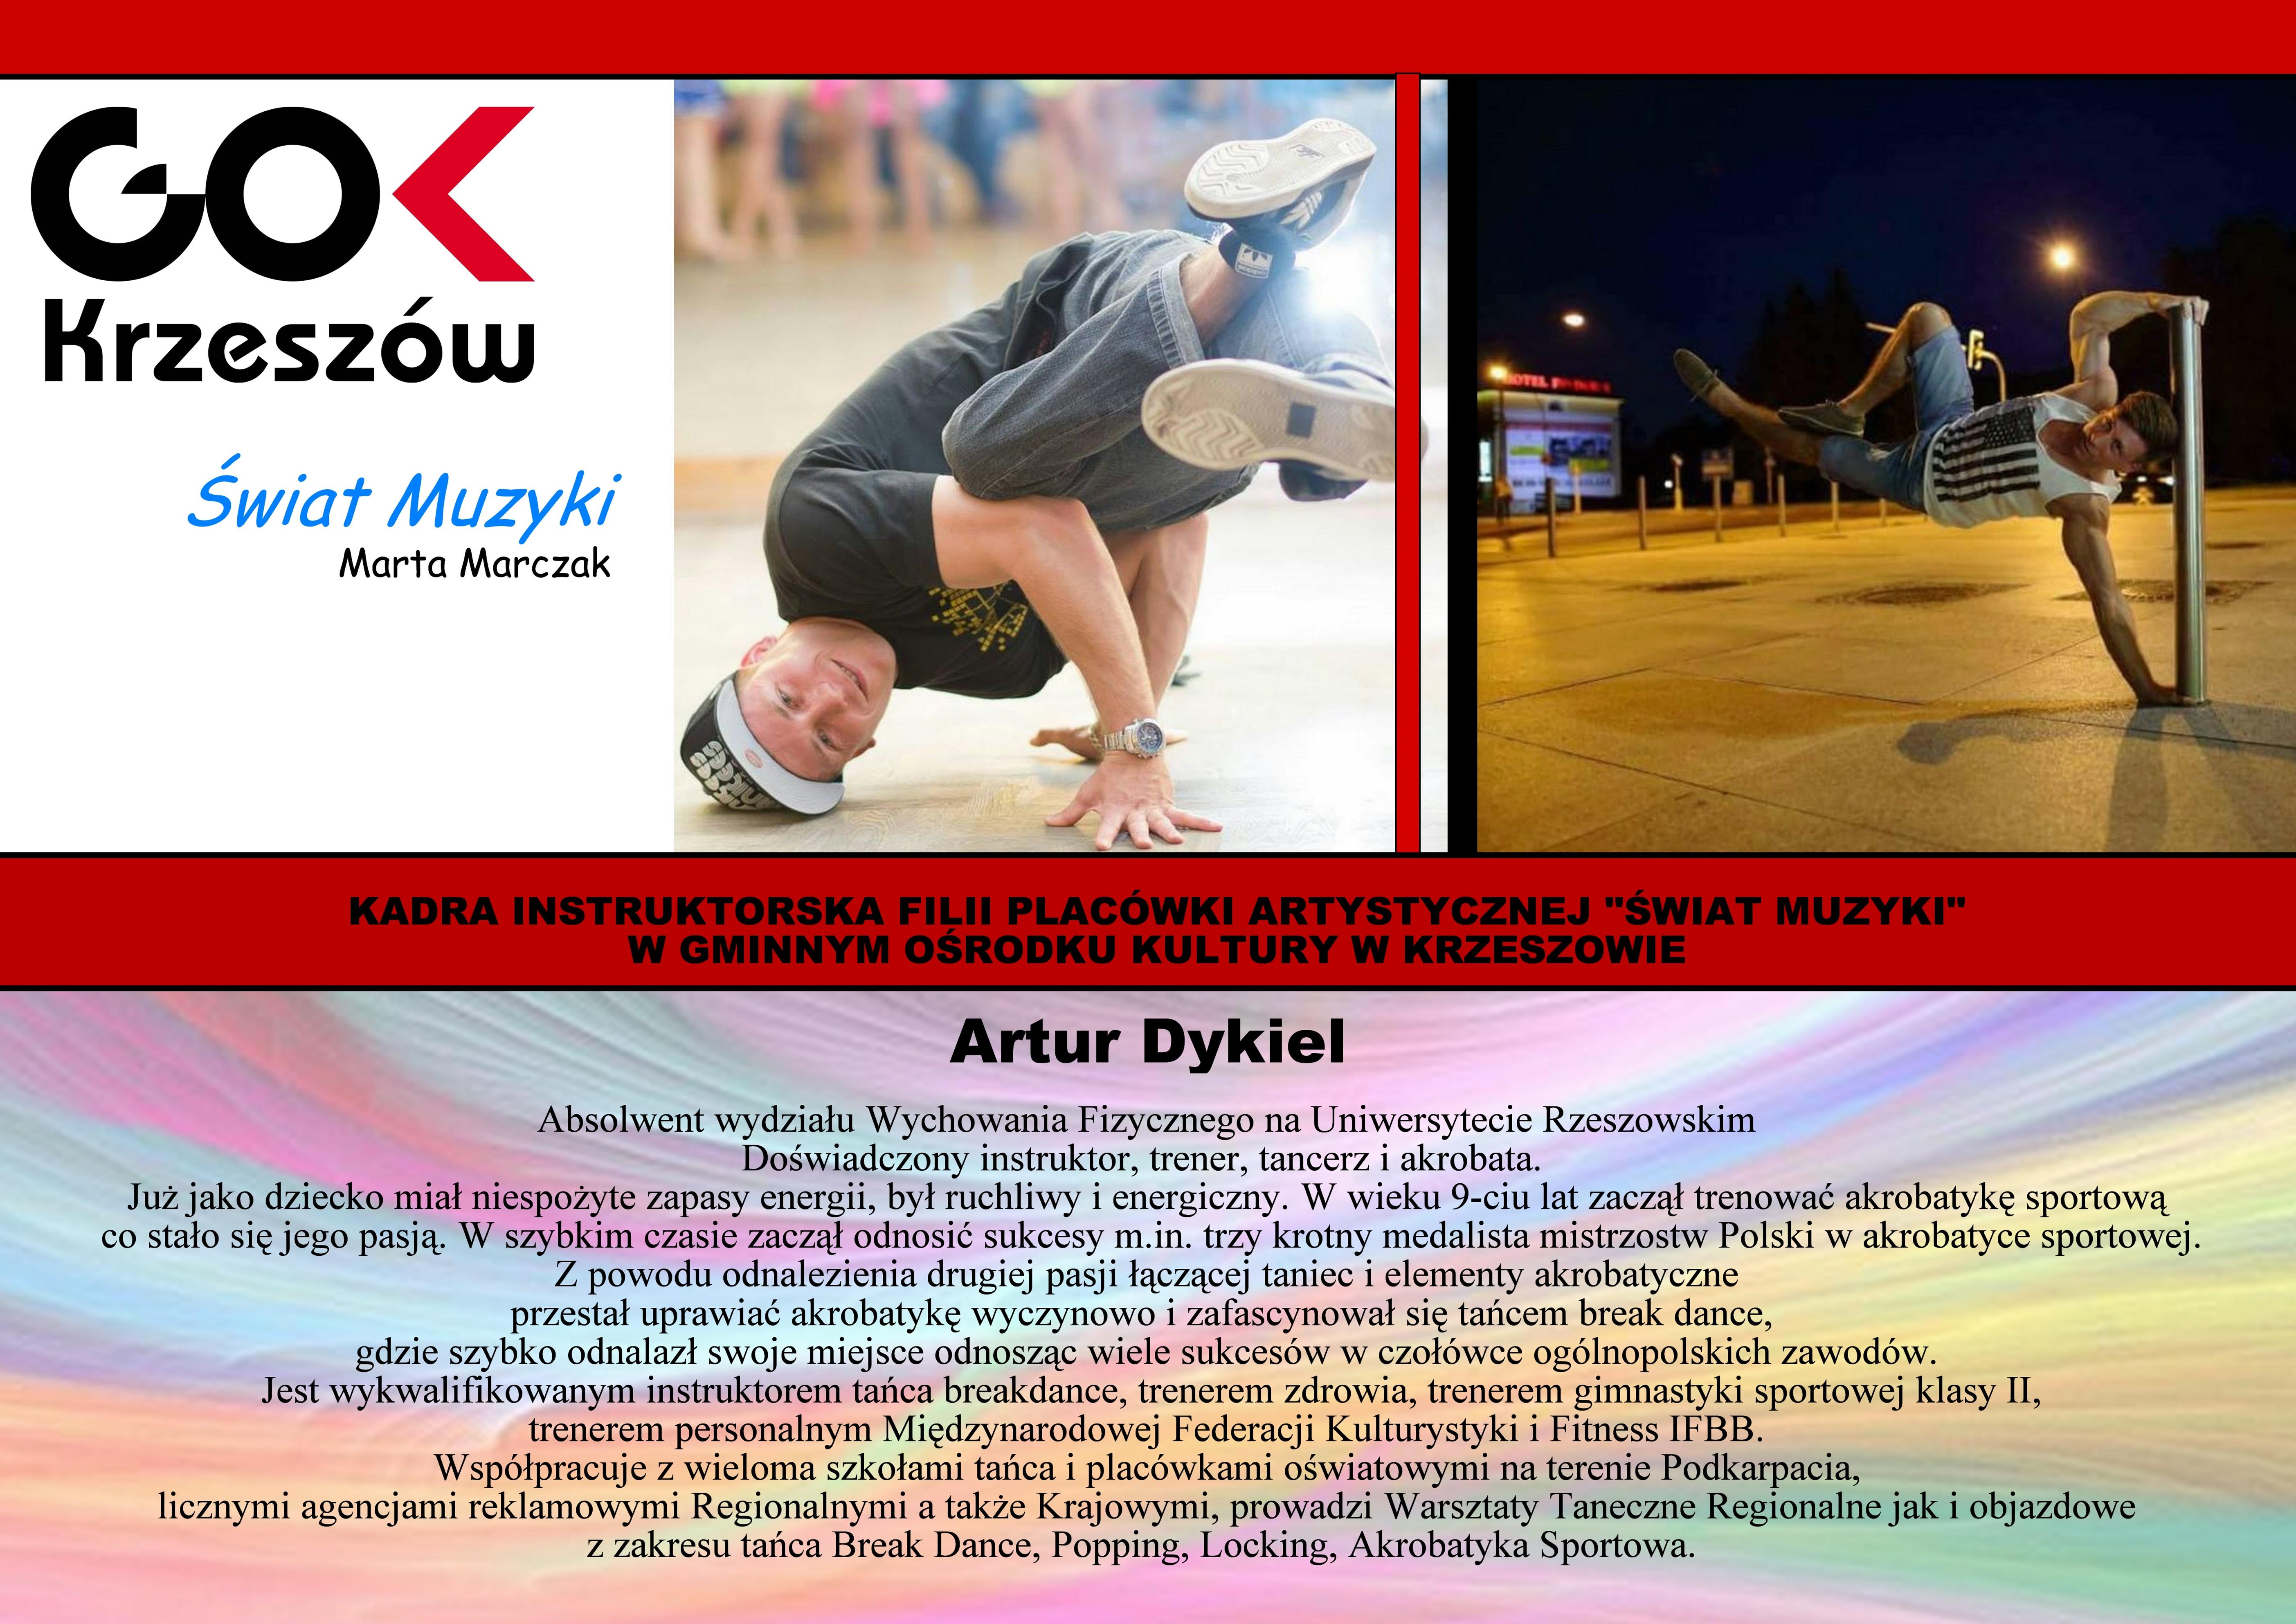 artur dykiel1